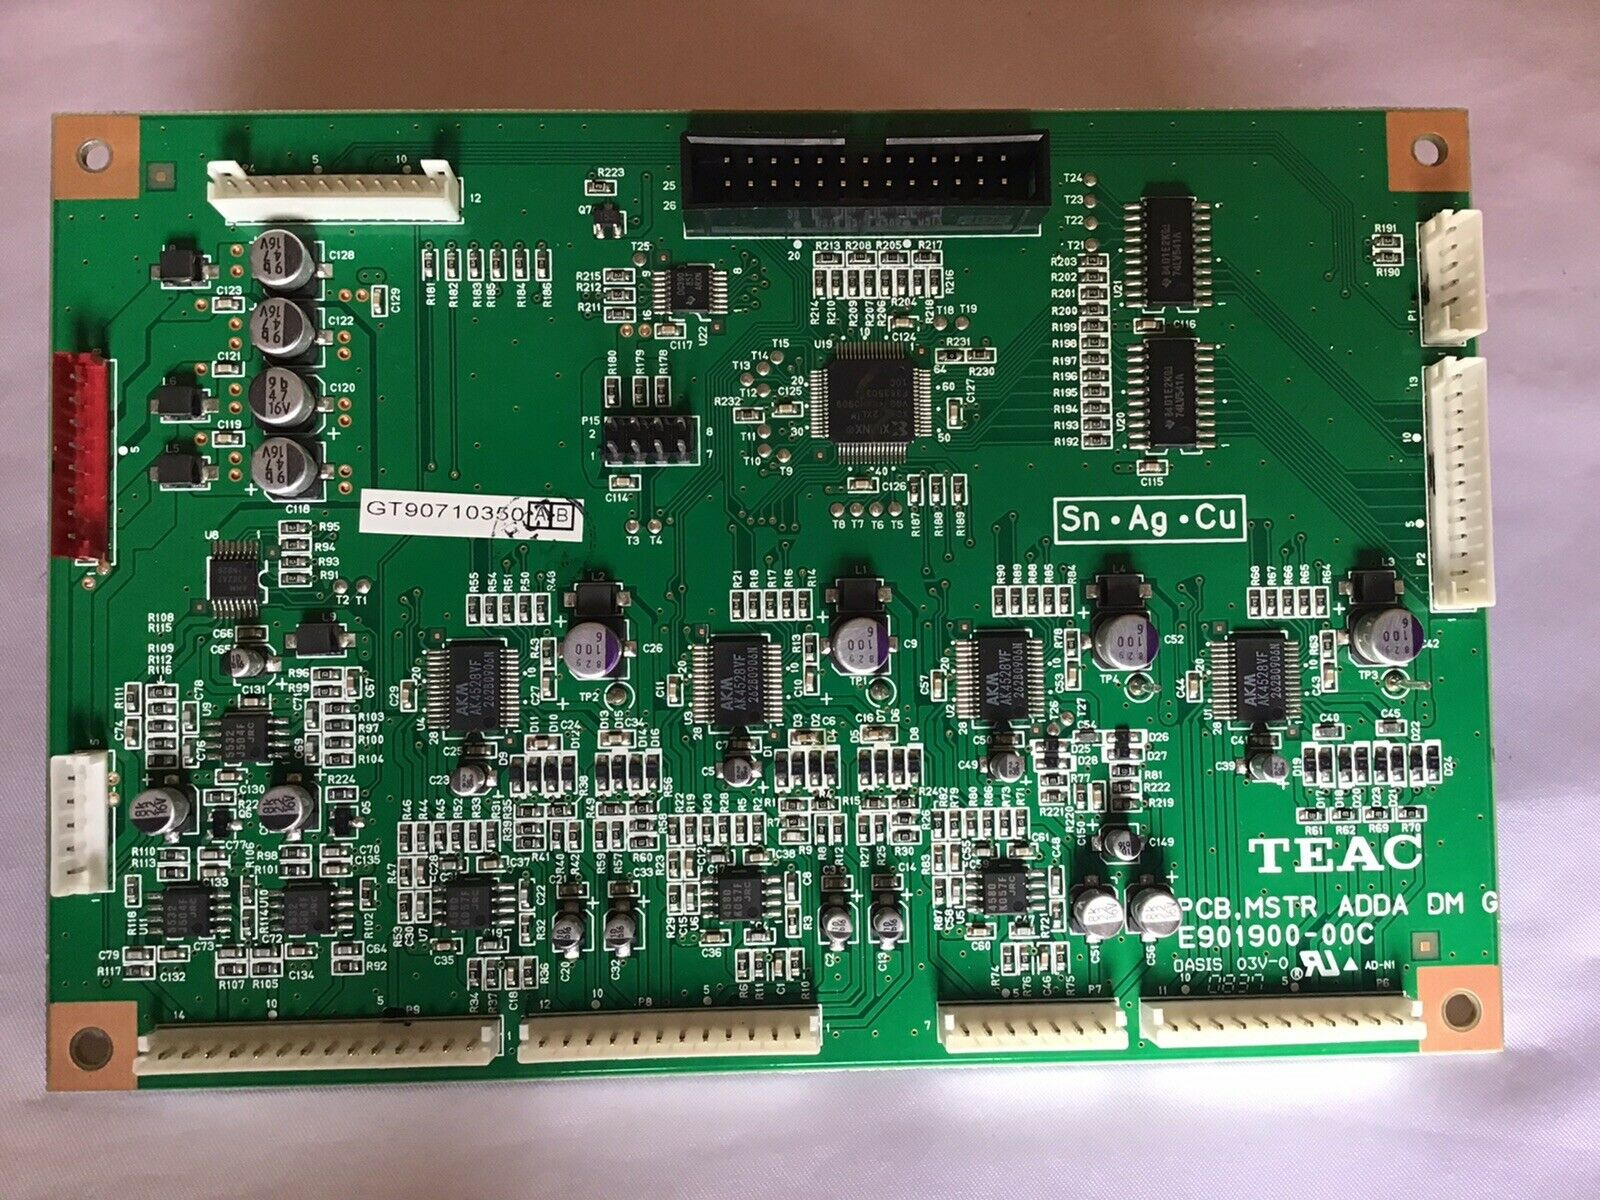 TASCAM DM 4800 PCB,MSTR ADDA DM Board Assembly, E901900-00C.